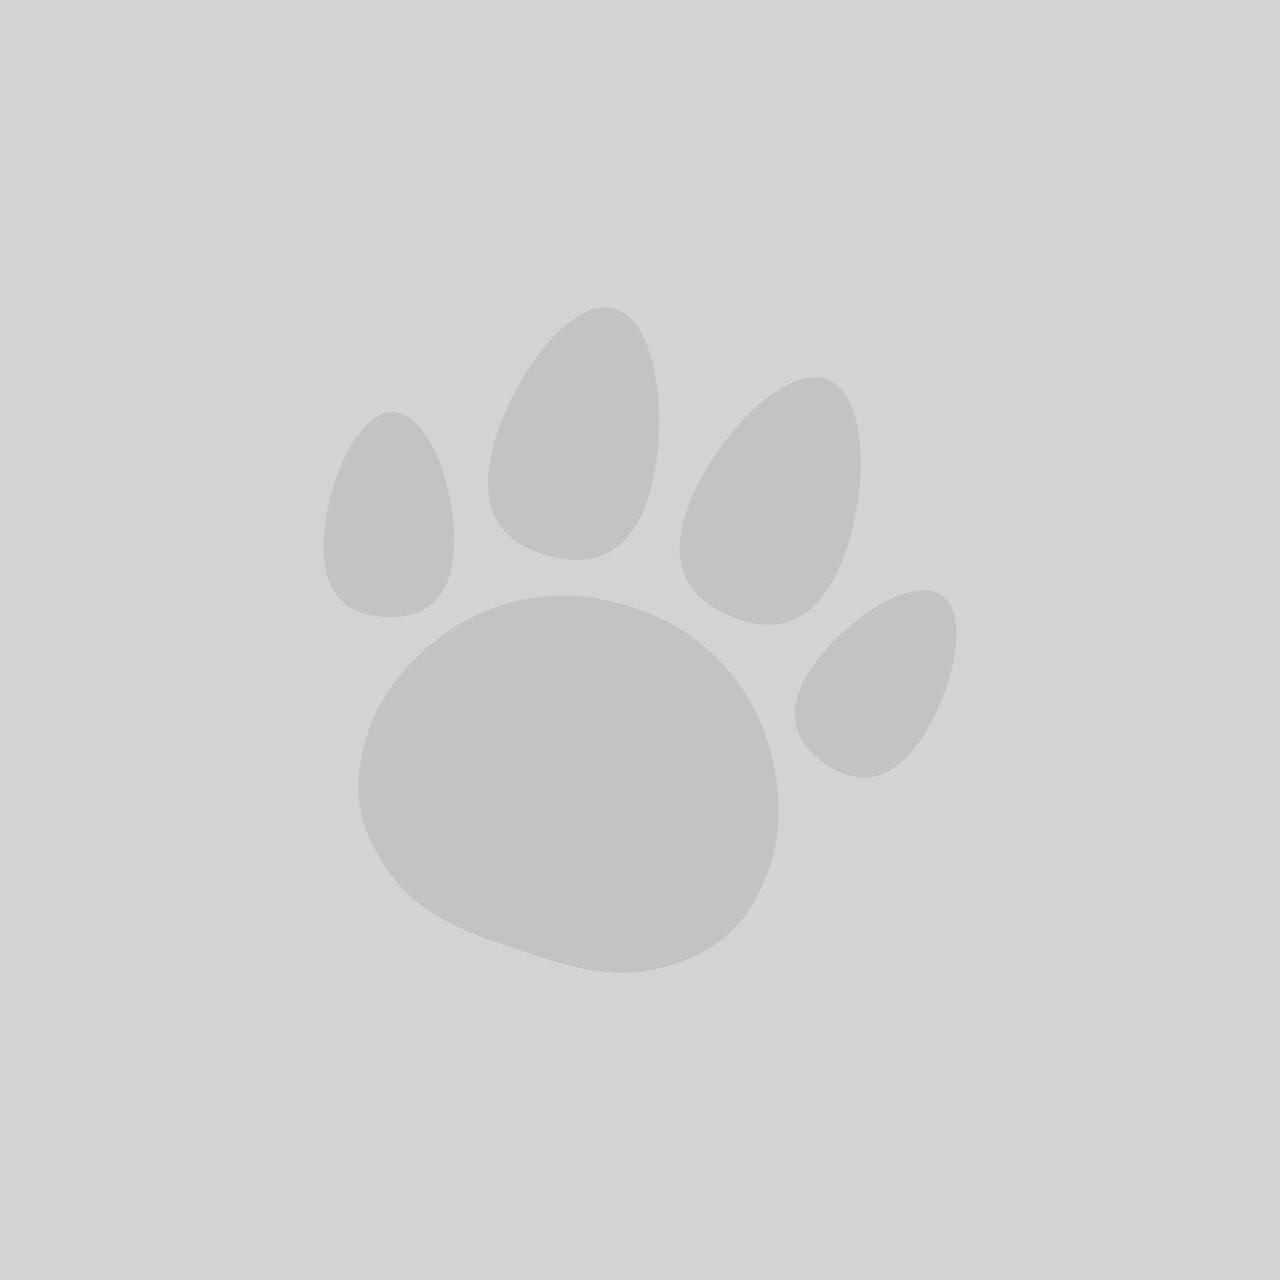 Hill's Science Plan Adult Cat Food Lamb & Rice Flavour 1.5kg